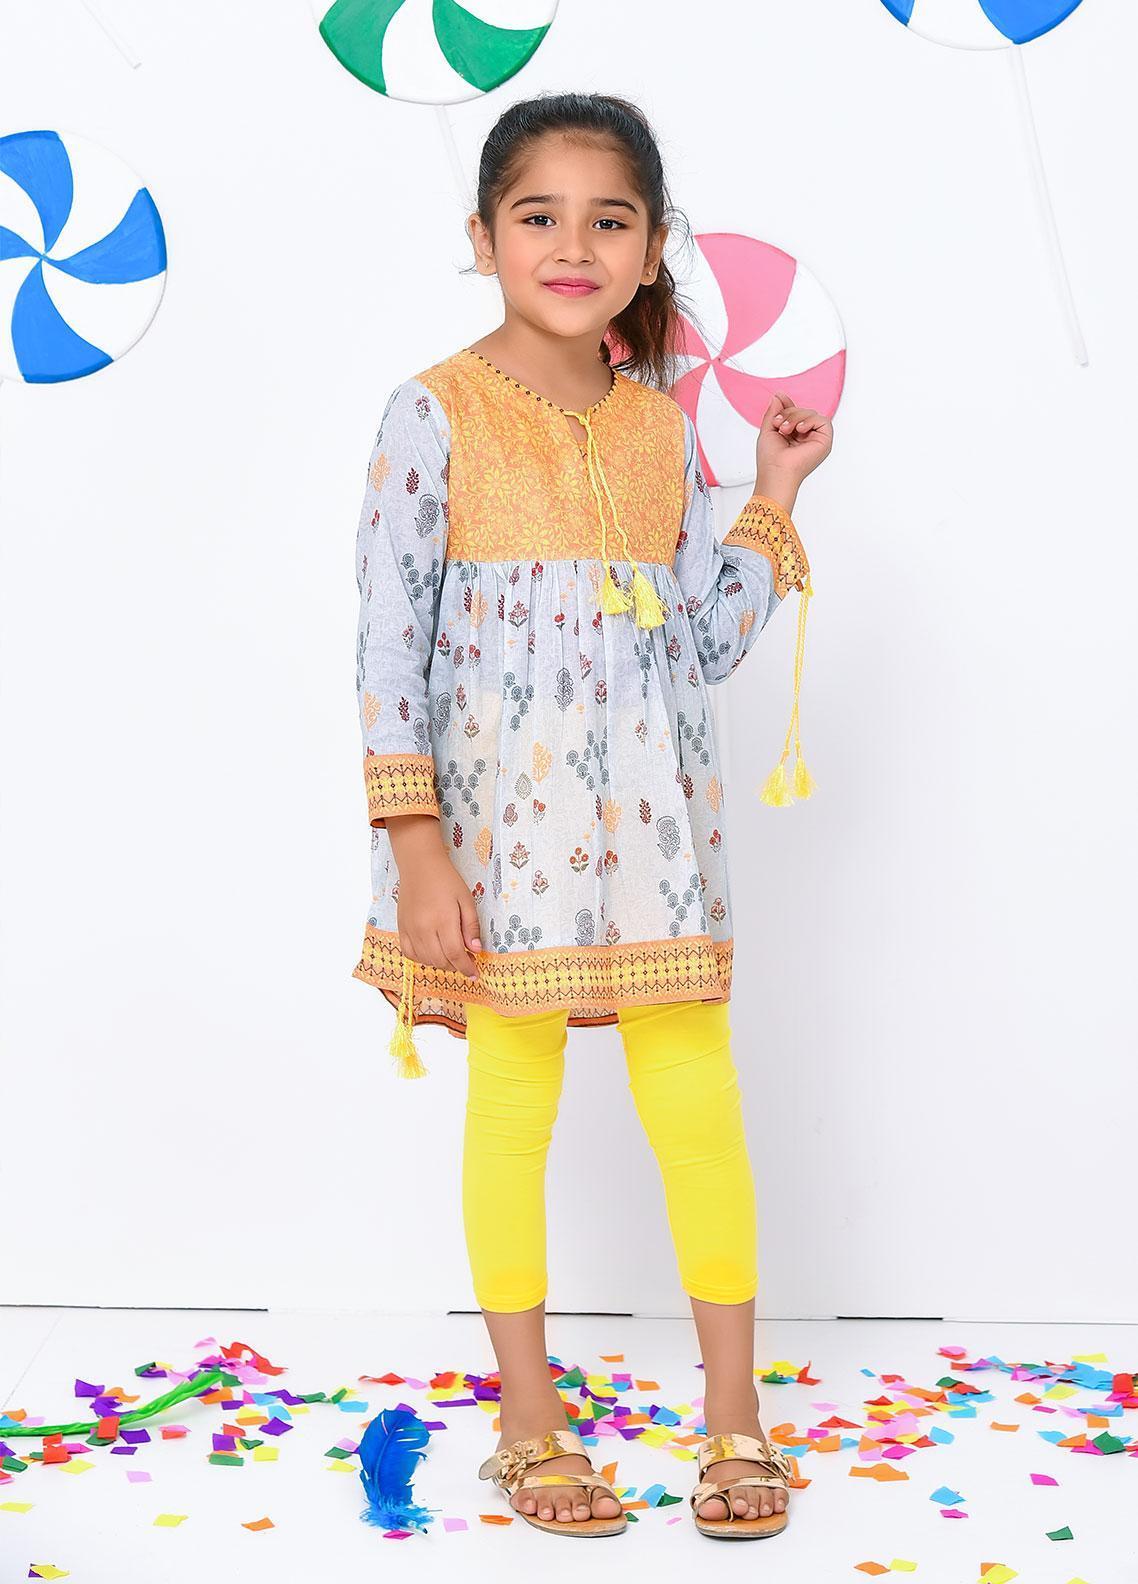 Ochre Lawn Embellished Formal Girls Kurtis -  OPL 40 Yellow